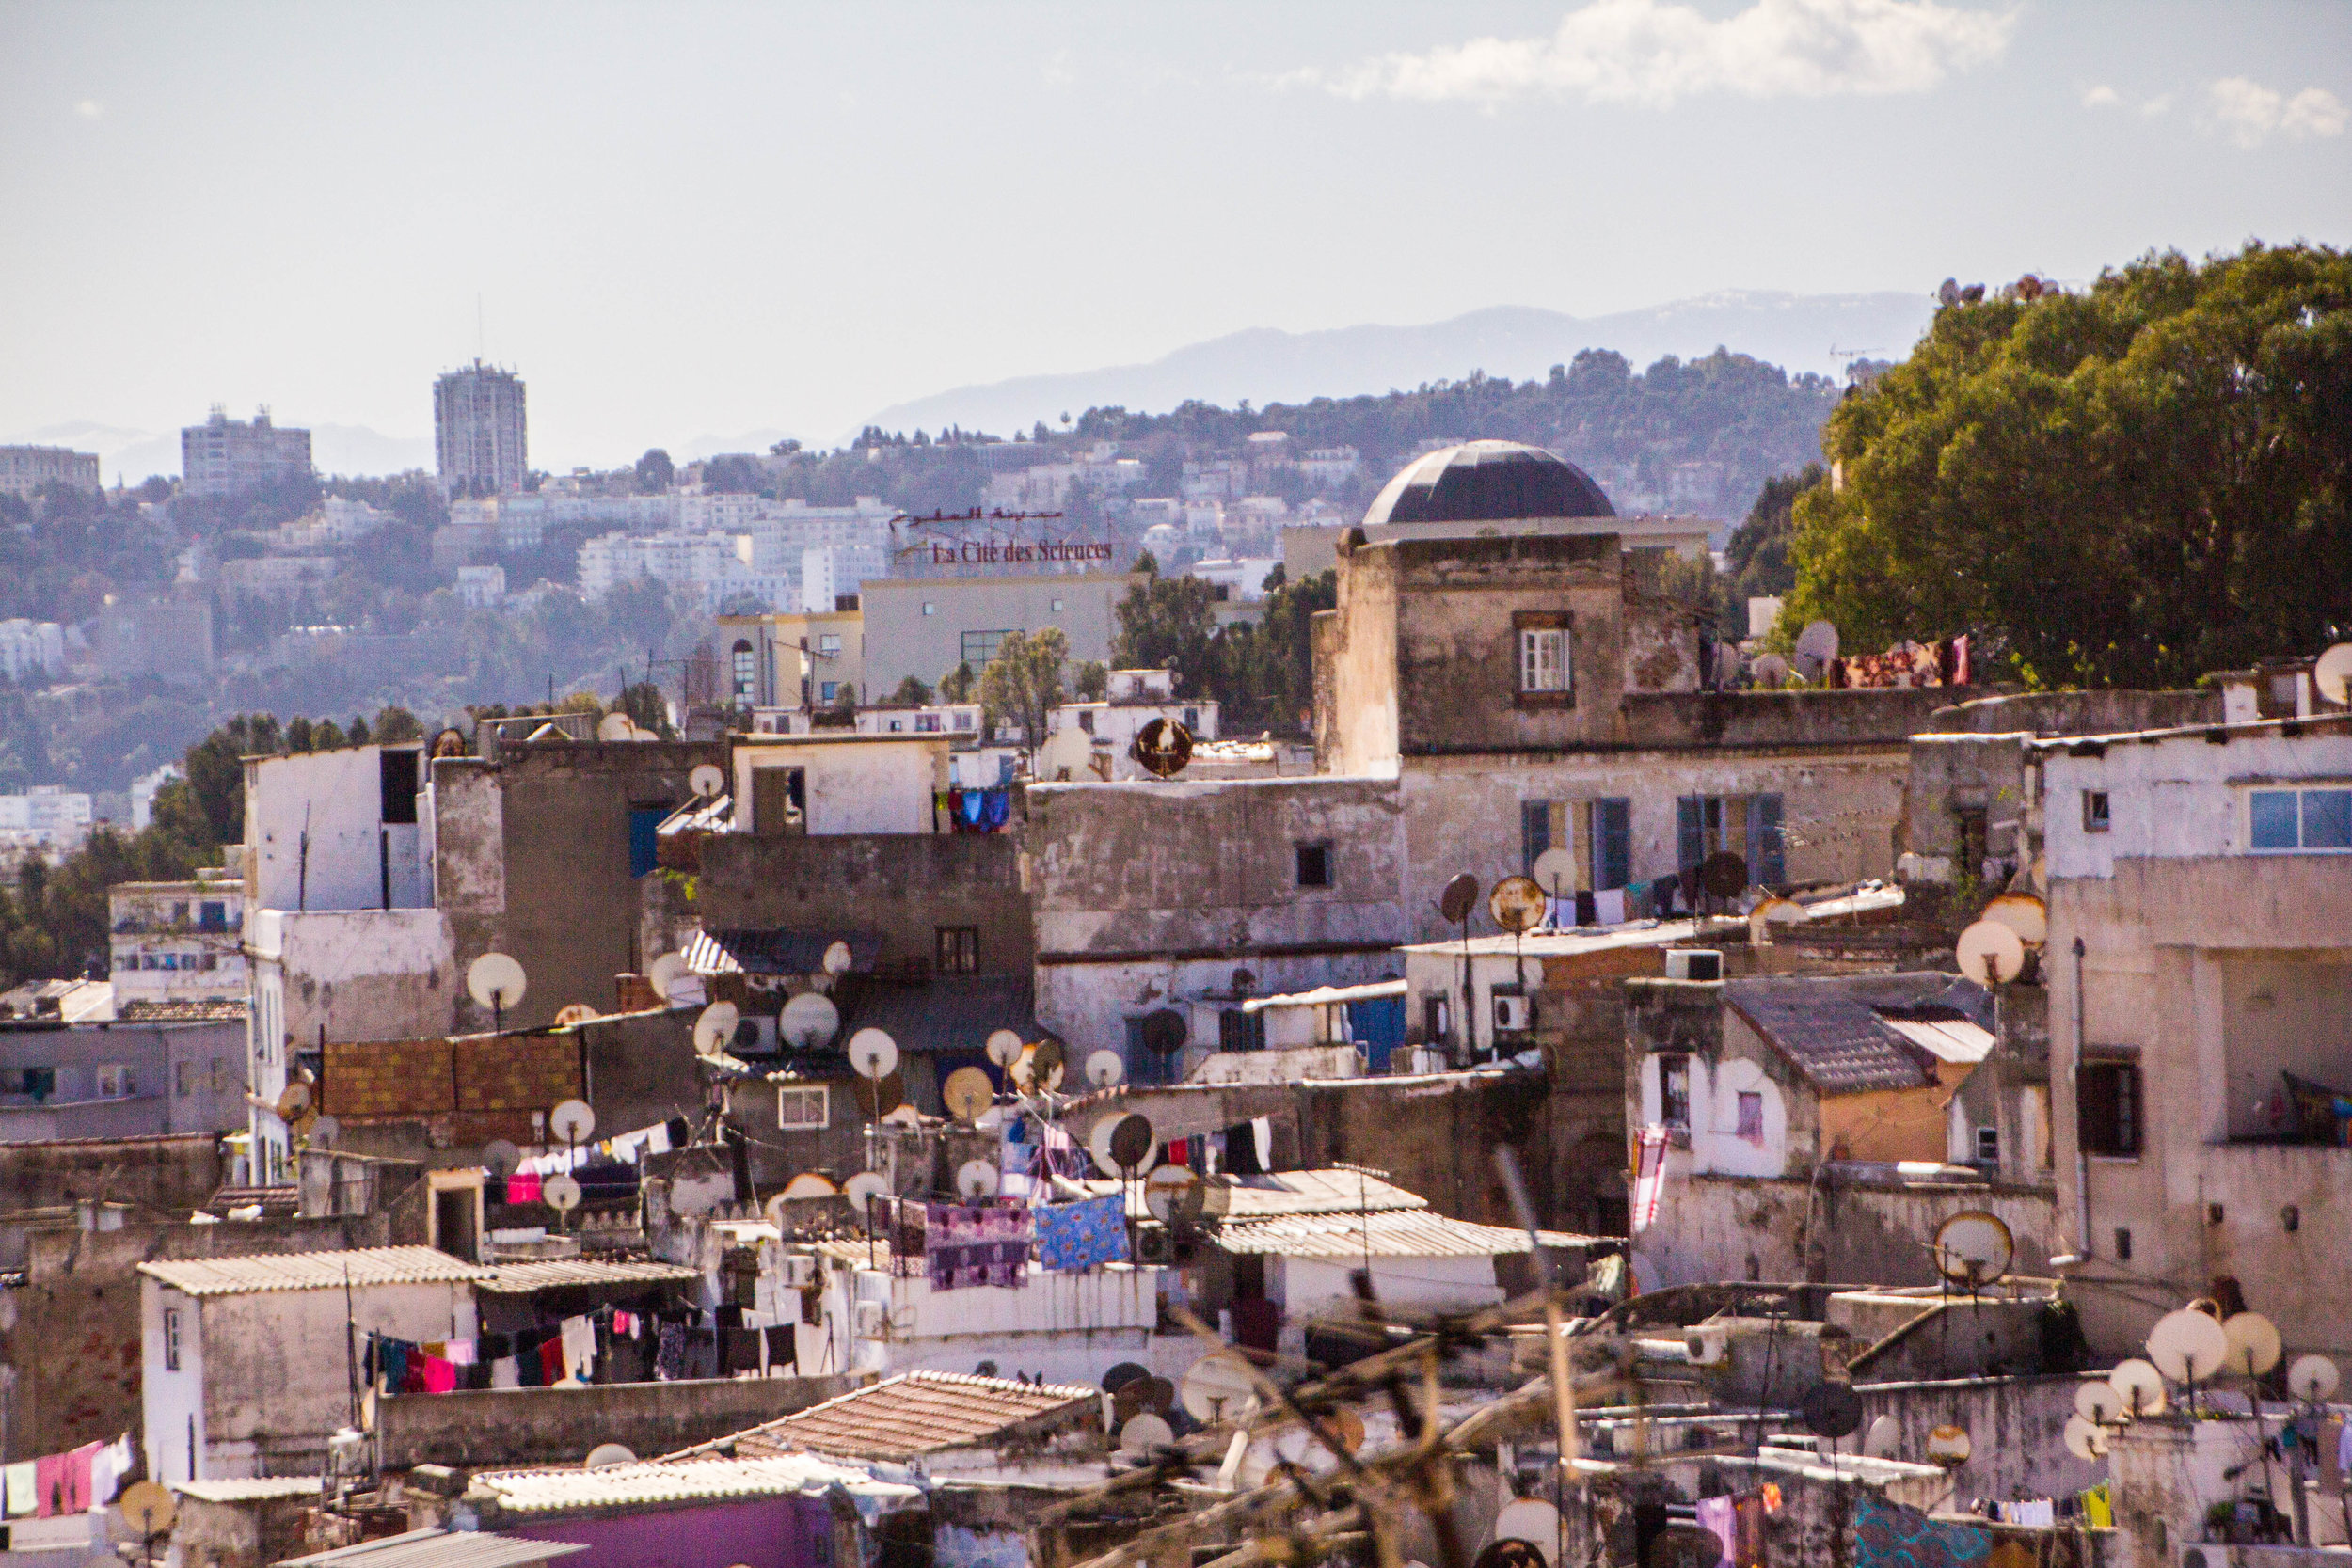 casbah-from-above-algiers-algeria-27.jpg